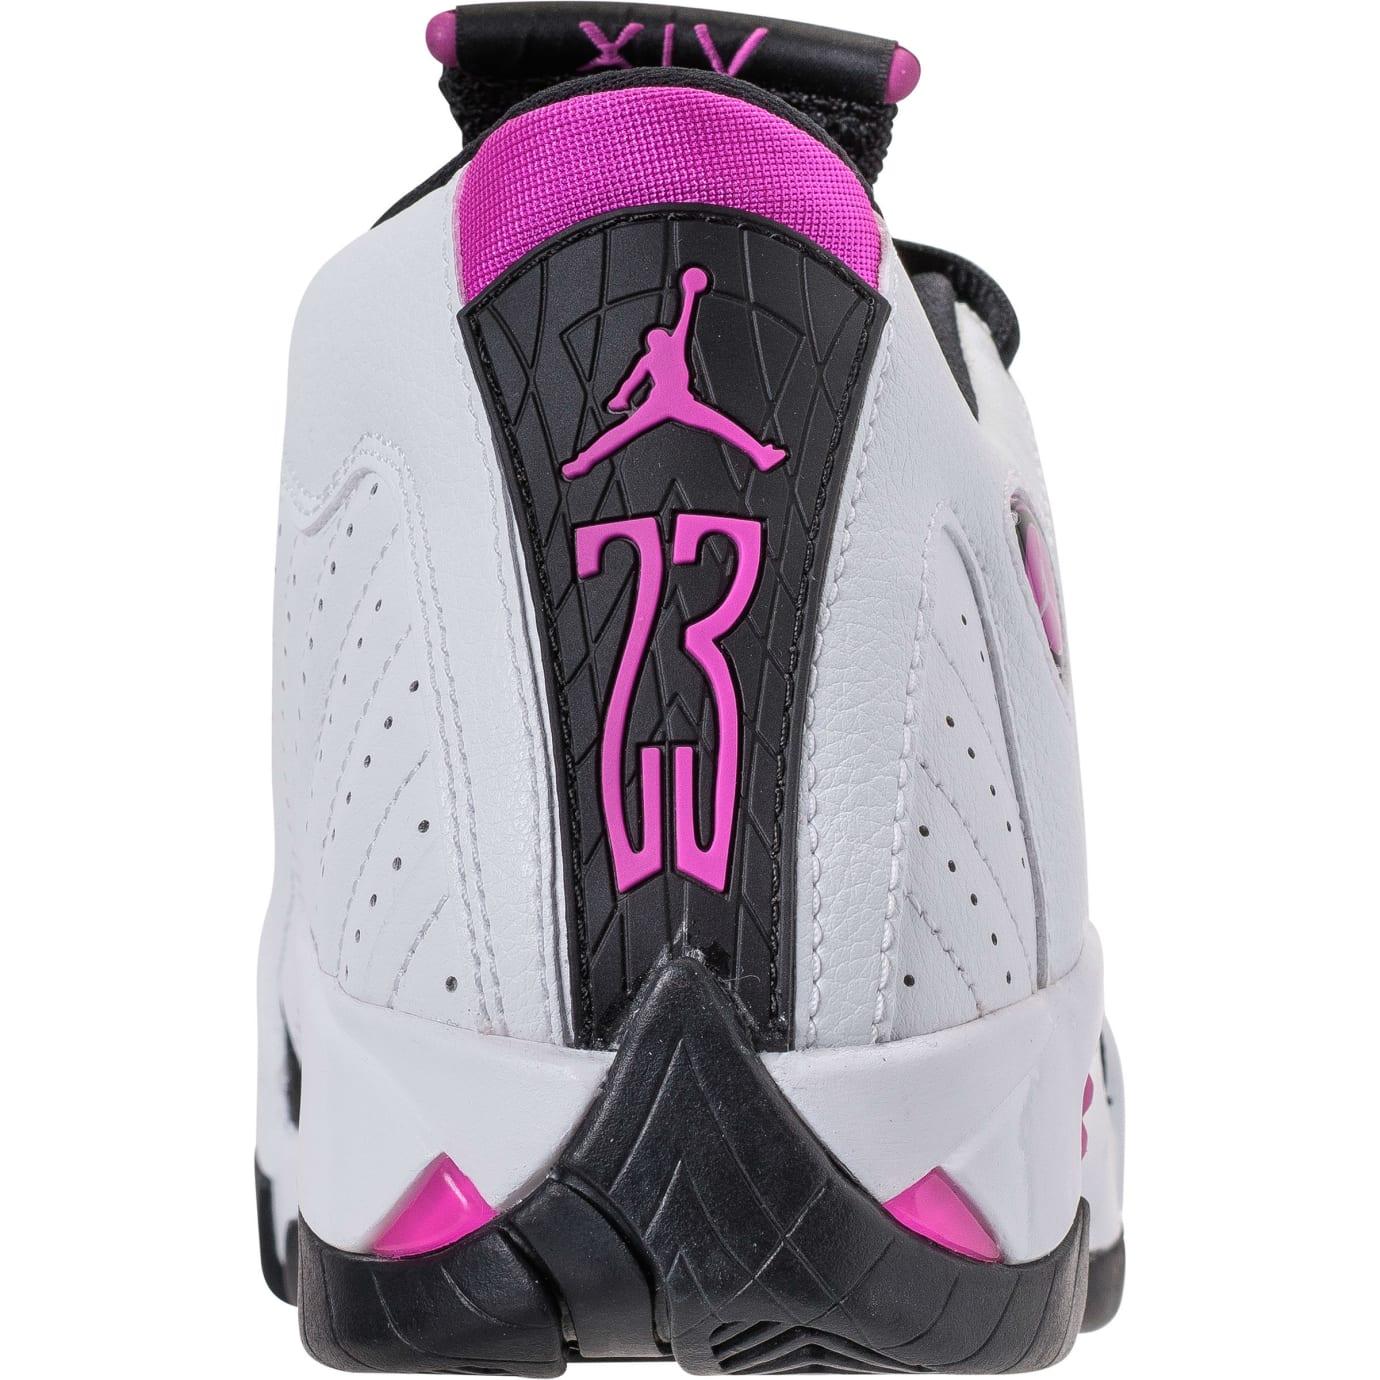 Air Jordan 14 XIV Girls Fuchsia Blast Release Date 654969-110 Heel 512390e16